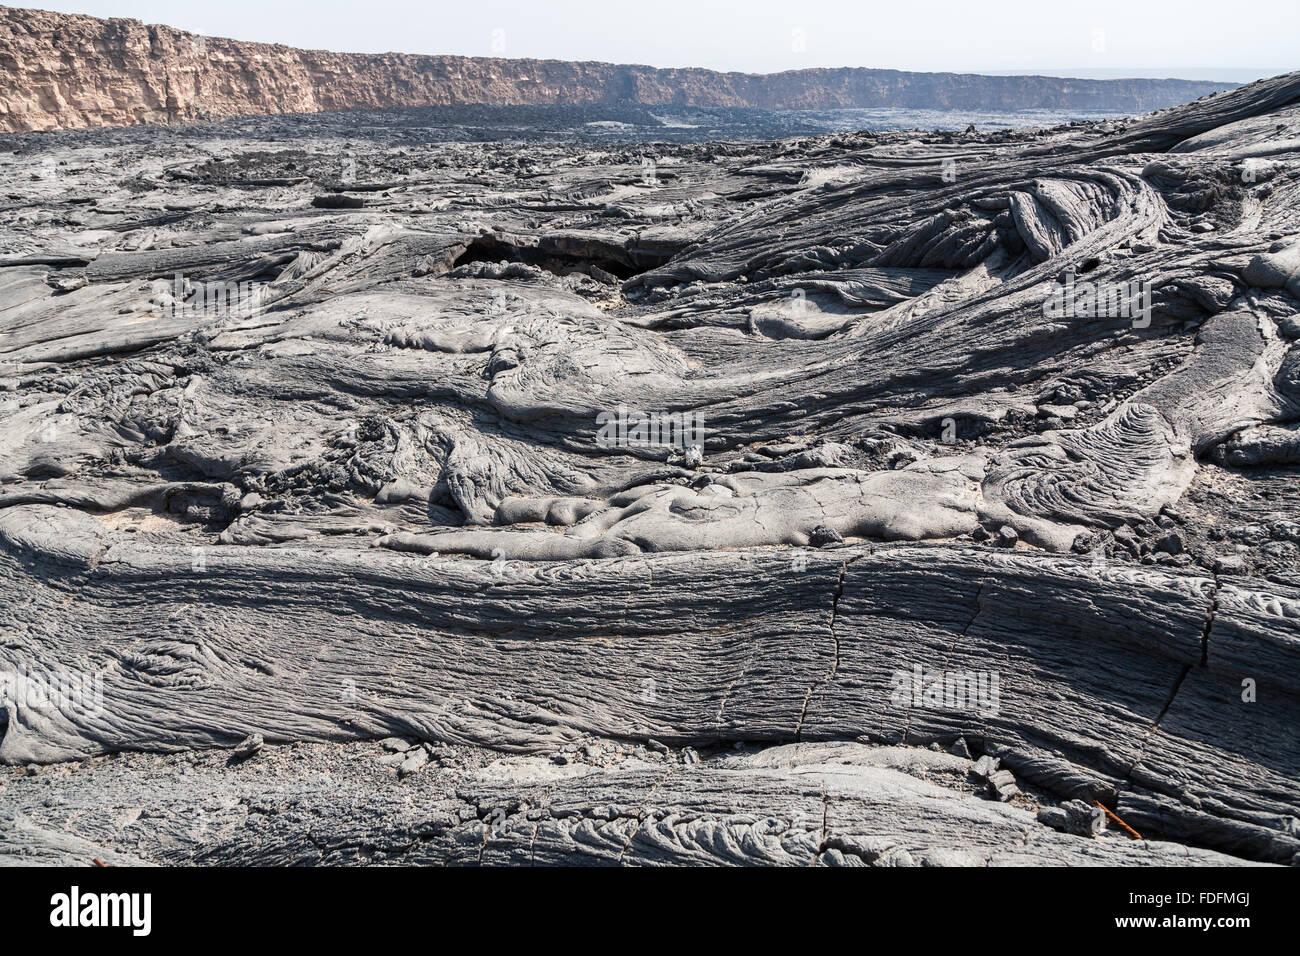 Swirls of grey basalt lava fill the caldera at the summit of Erta Ale volcano in Ethiopia - Stock Image